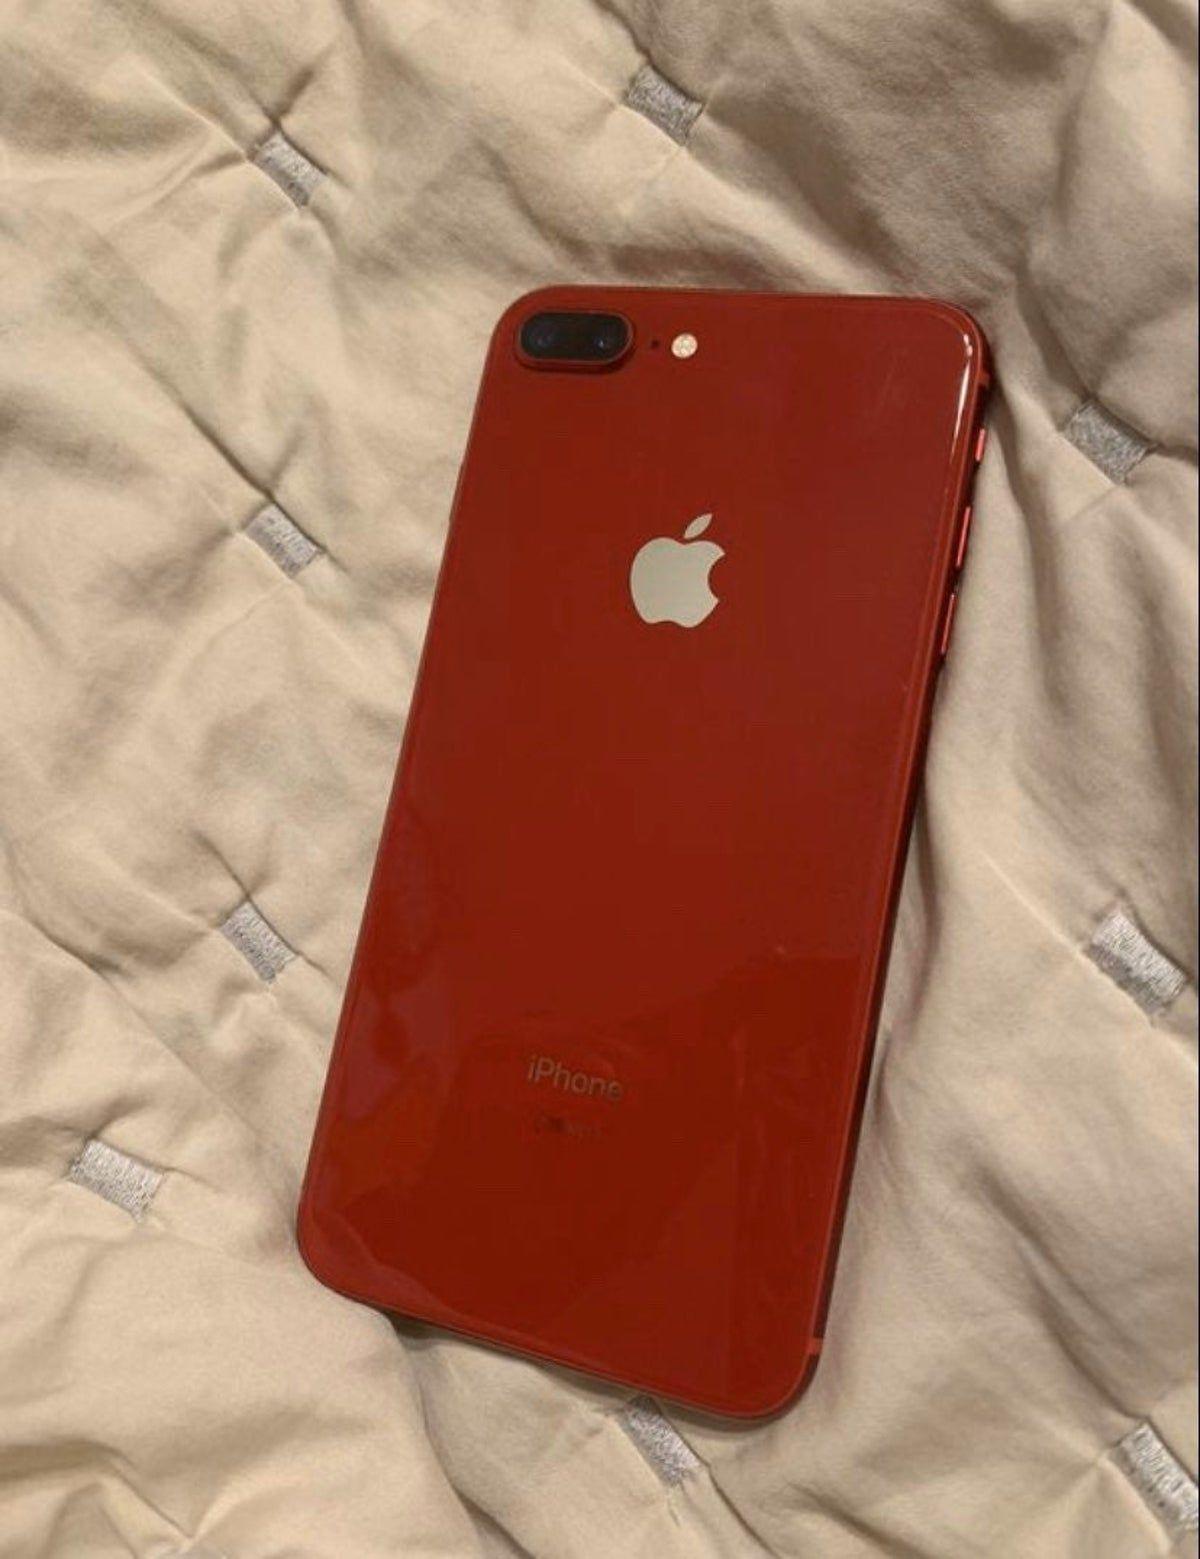 Red Iphone 8 Plus 64 Gb Att Iphone Iphone 8 Plus Iphone 8